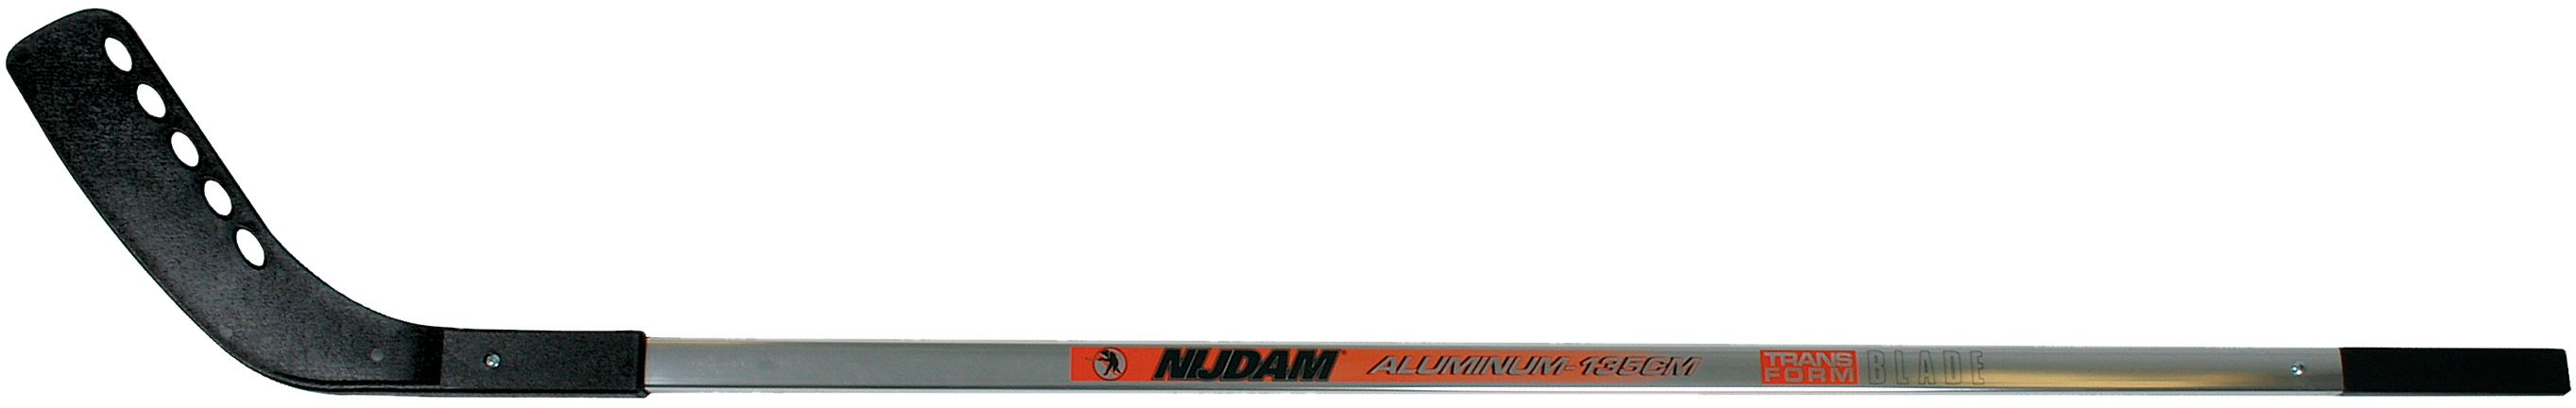 IJshockeystick Aluminium • 135 cm •